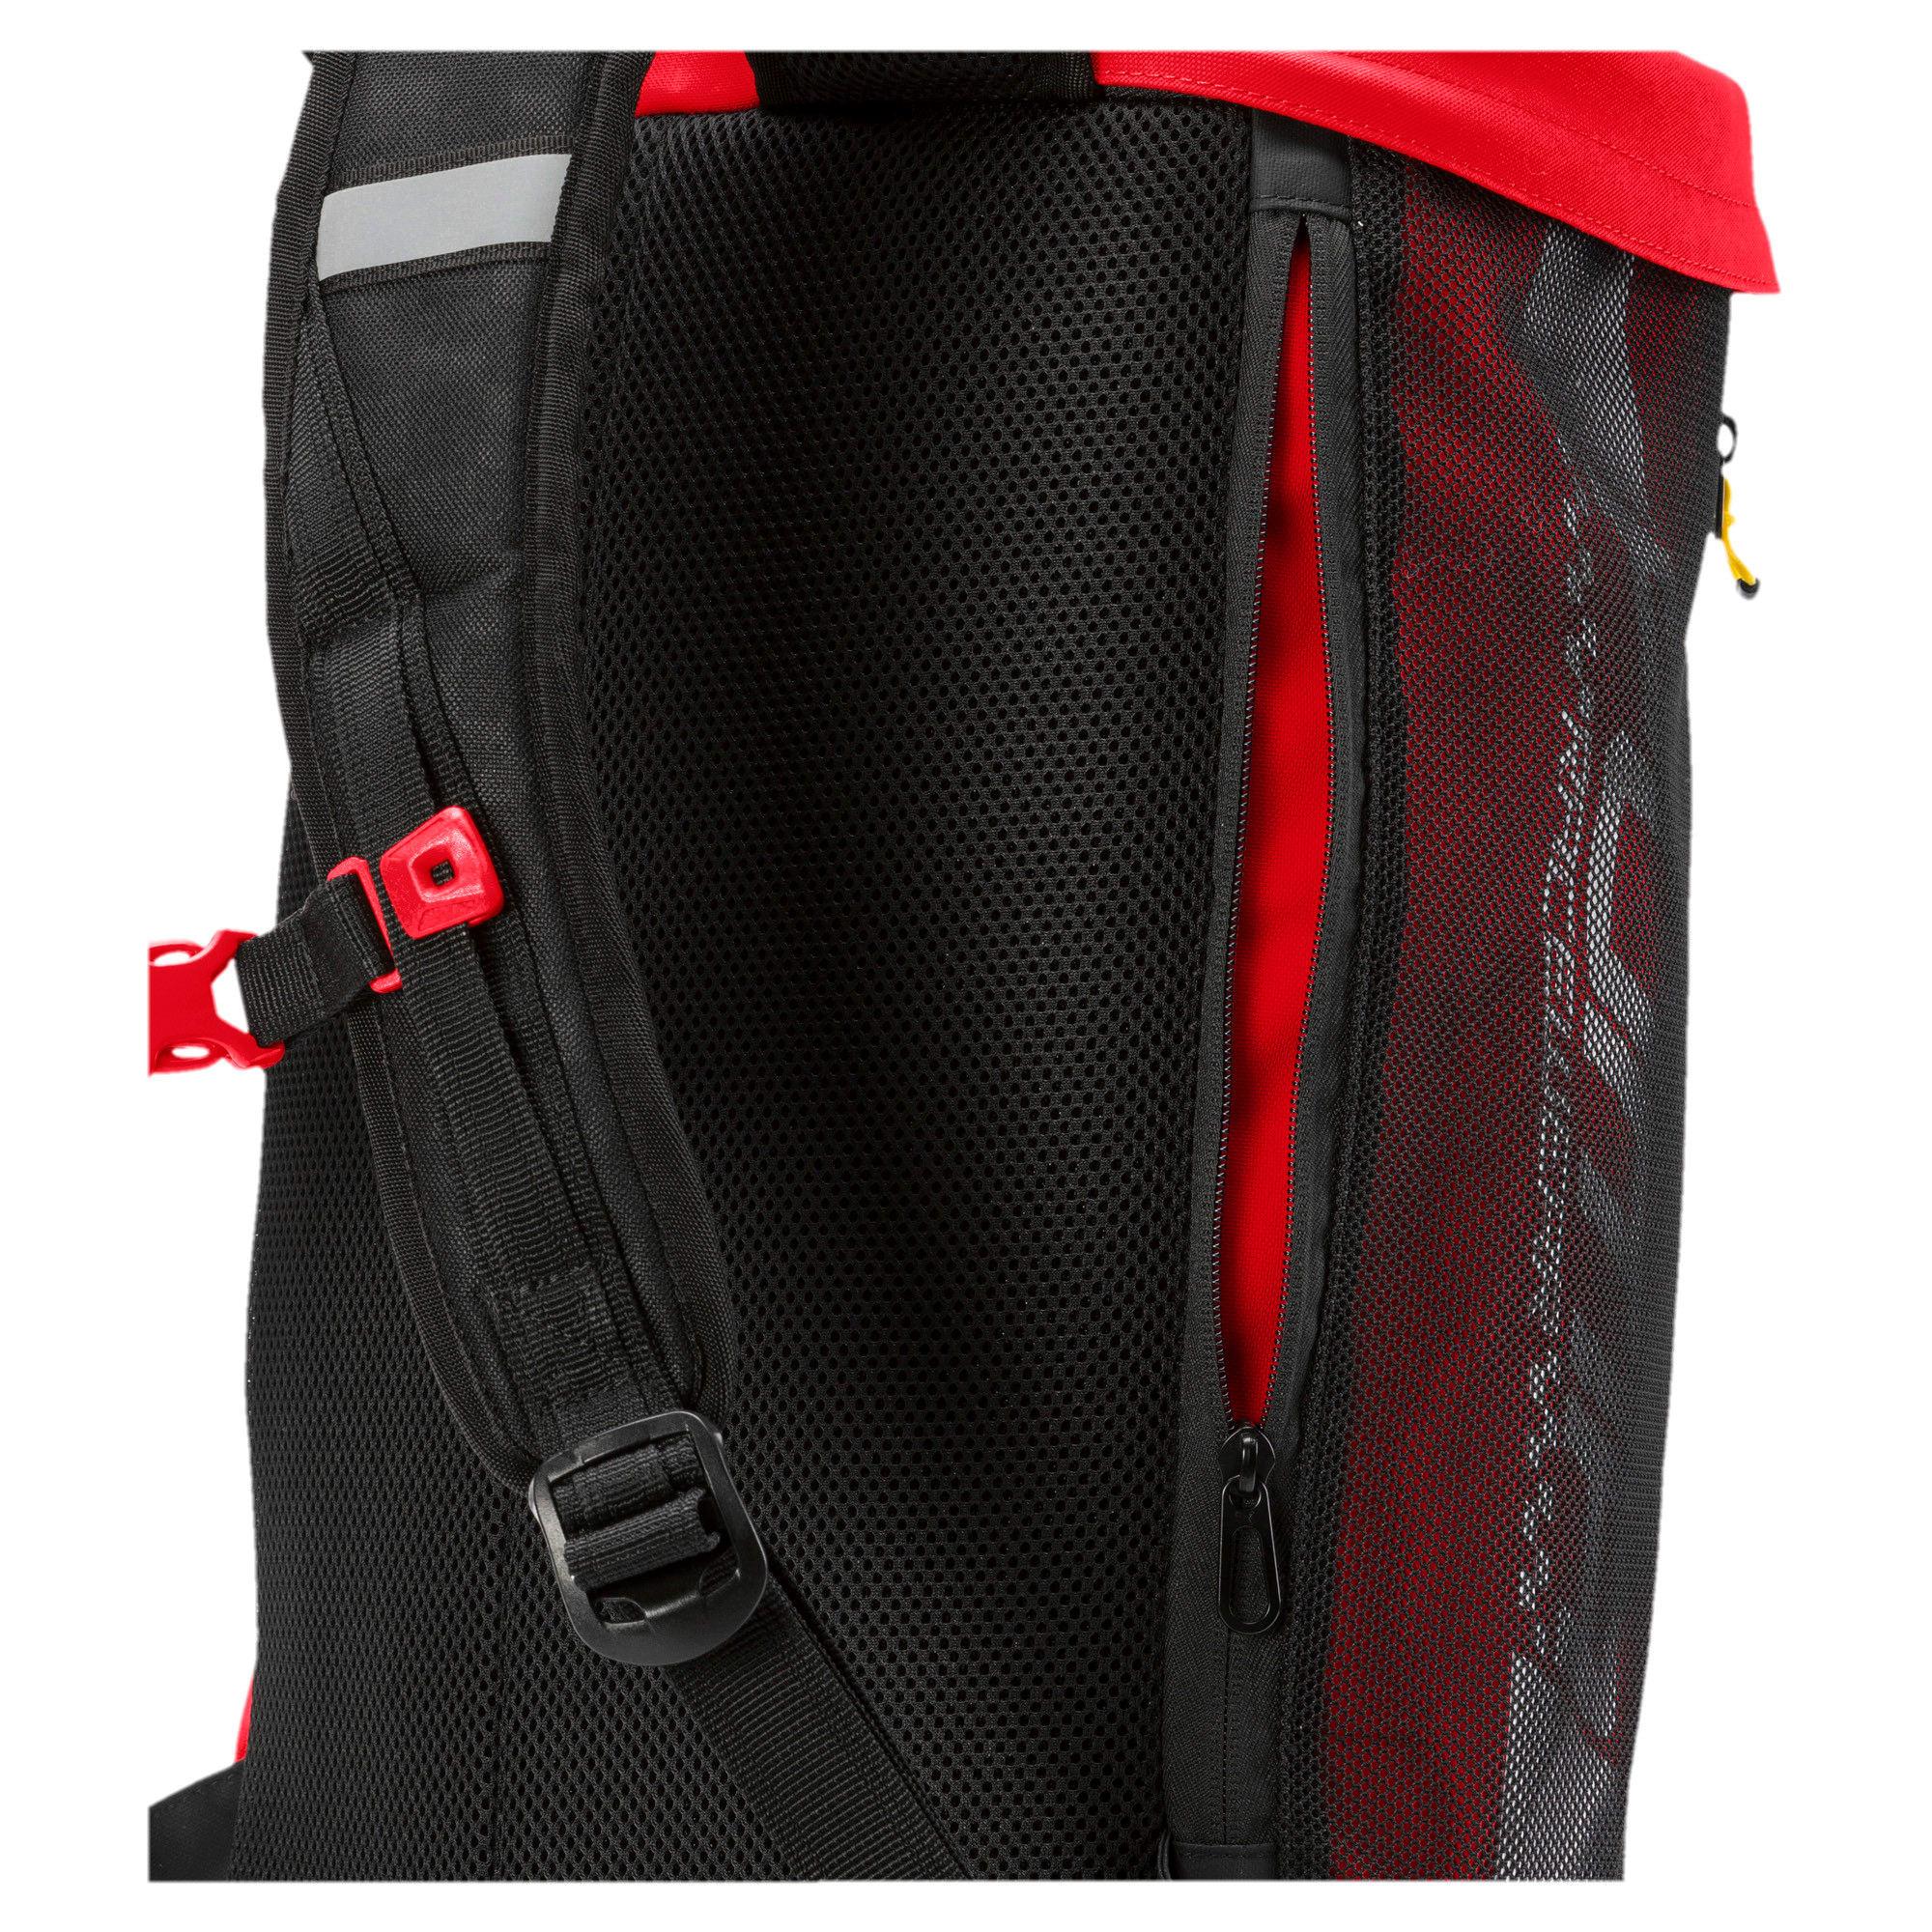 Thumbnail 3 of Ferrari Fanwear RCT Backpack, Rosso Corsa, medium